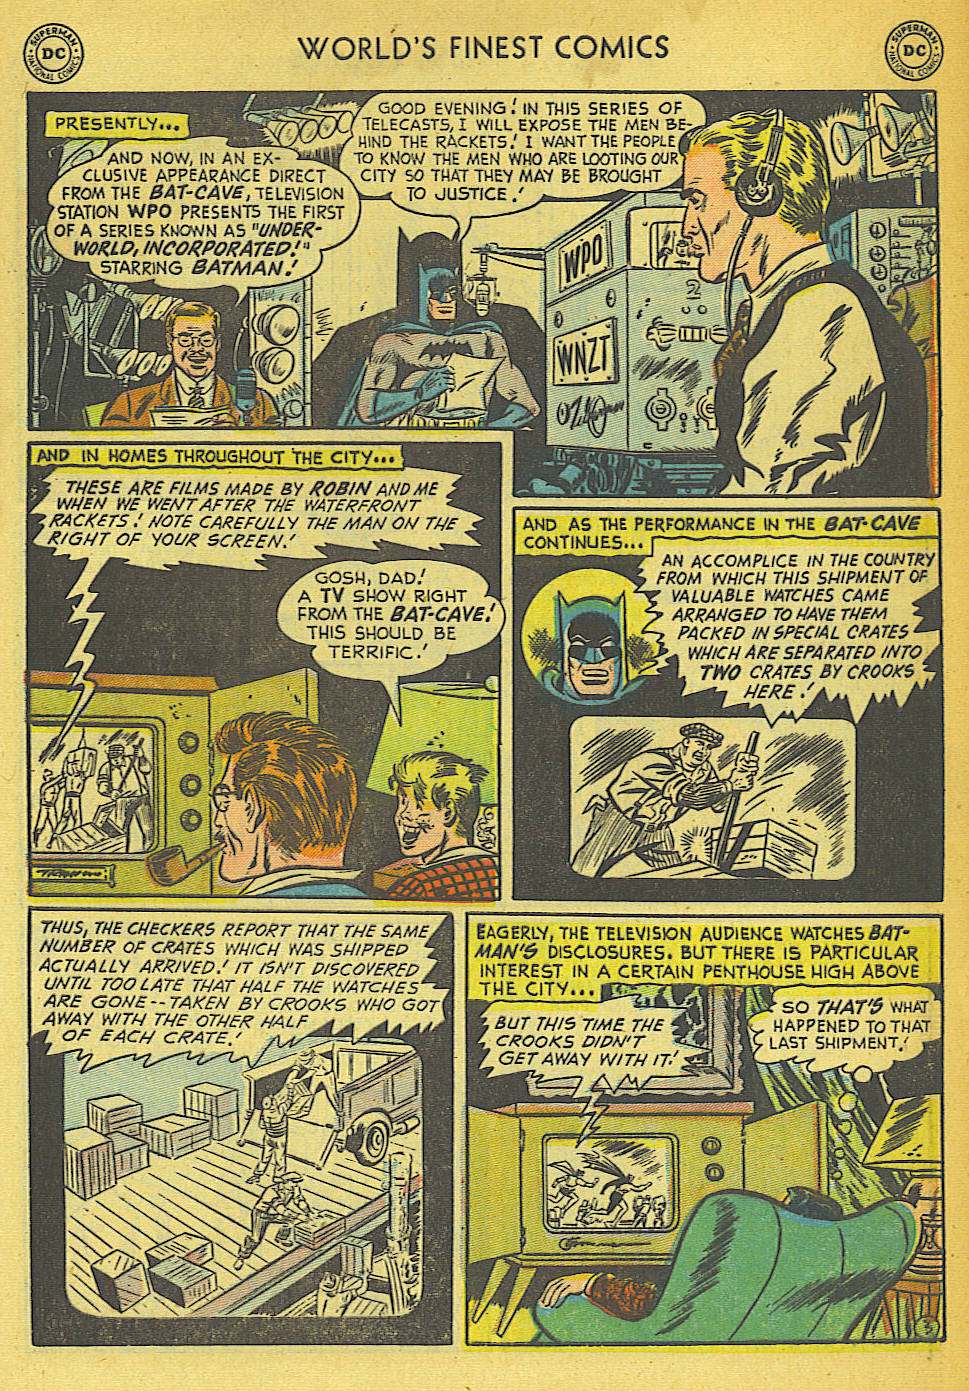 Read online World's Finest Comics comic -  Issue #57 - 55